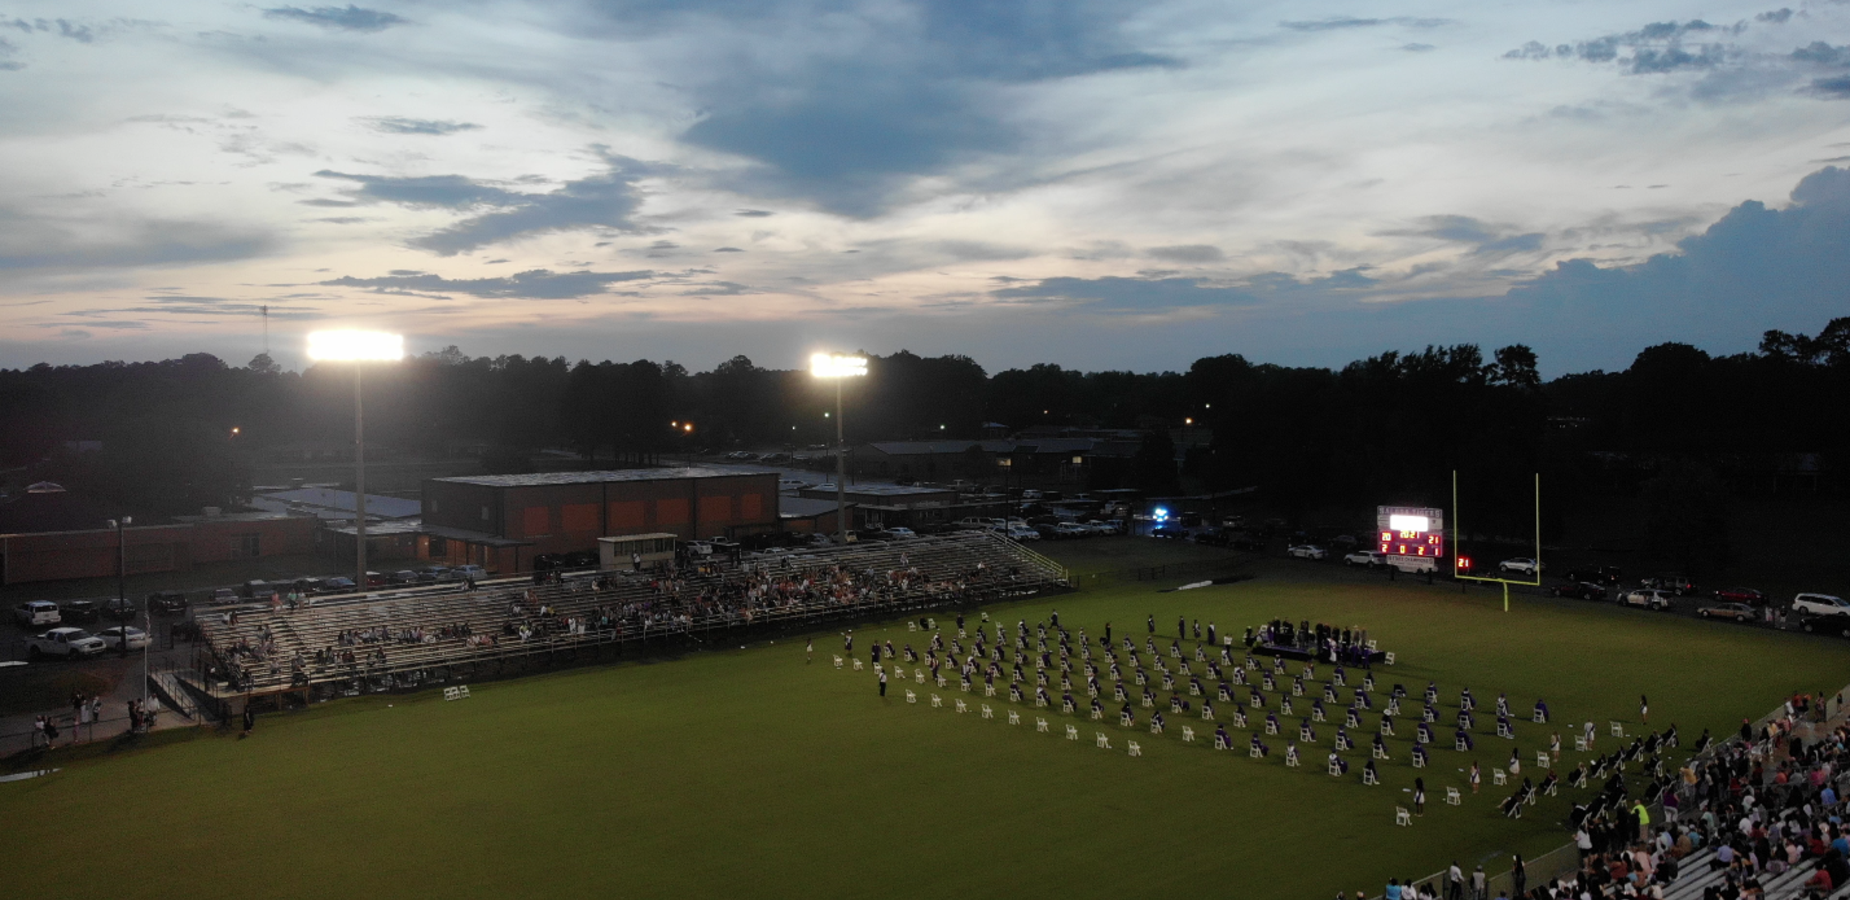 2021 High School Graduation